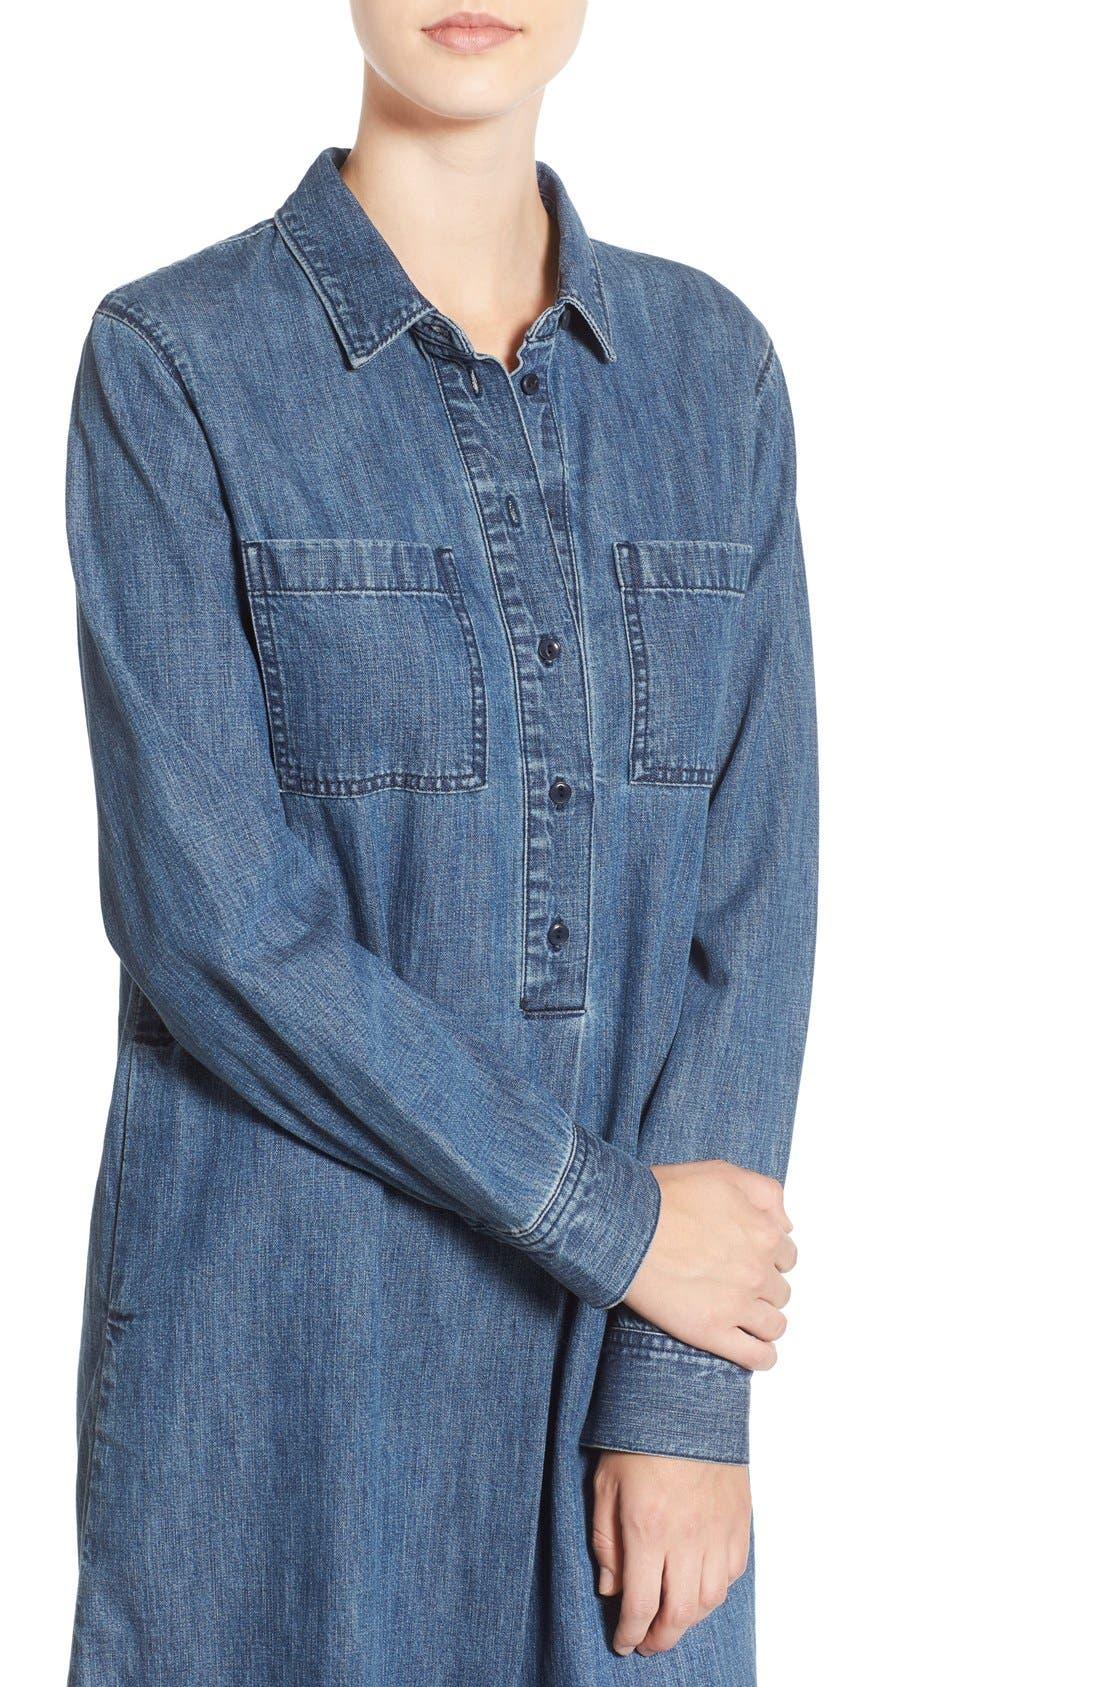 MADEWELL,                             Denim Shirtdress,                             Alternate thumbnail 4, color,                             405